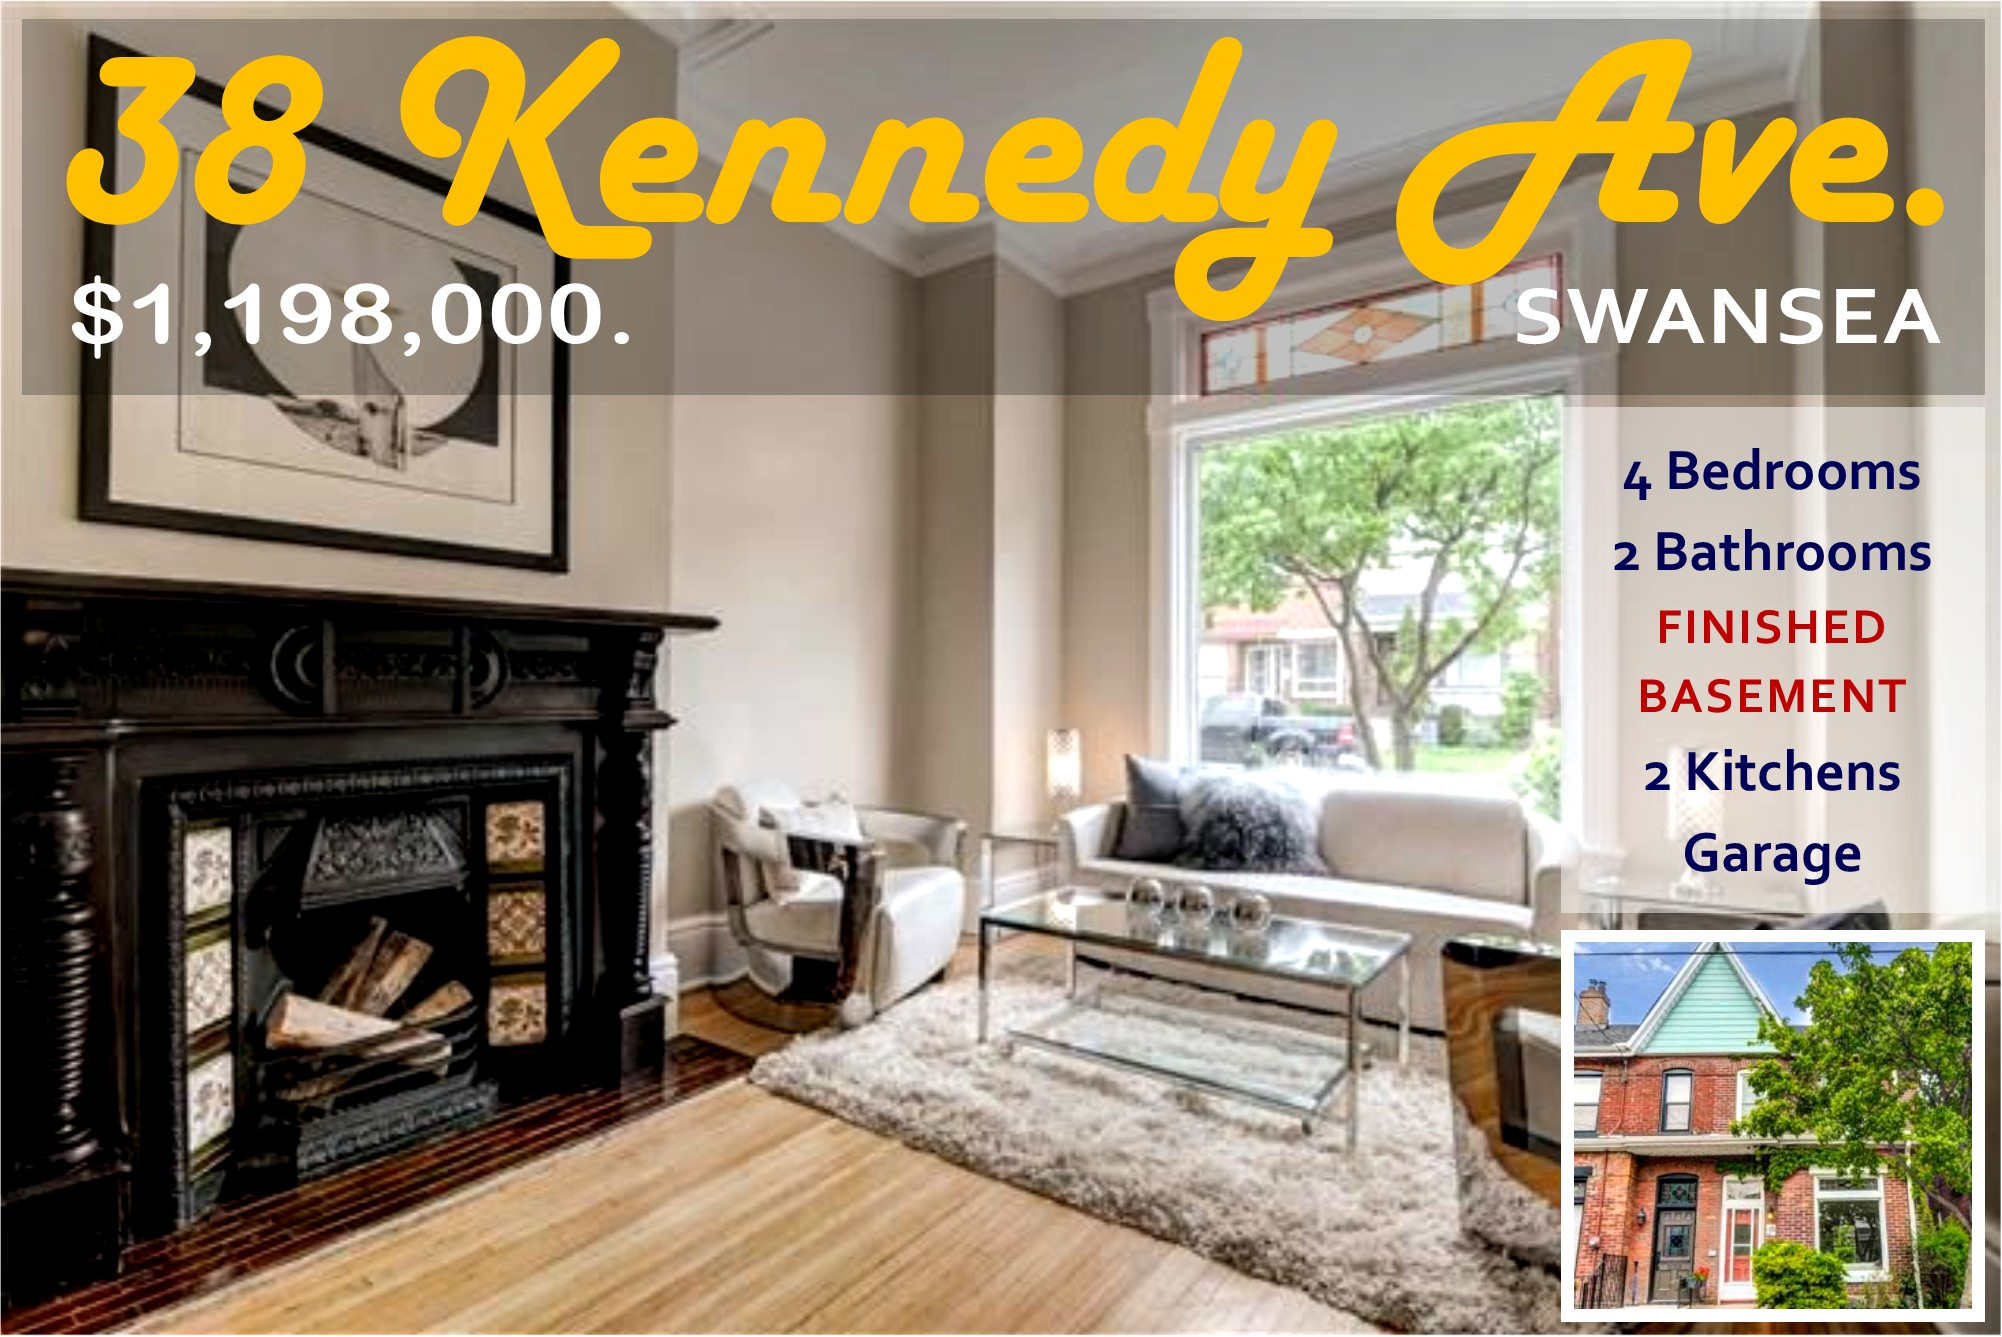 38 Kennedy Ave. TWITTER.jpg